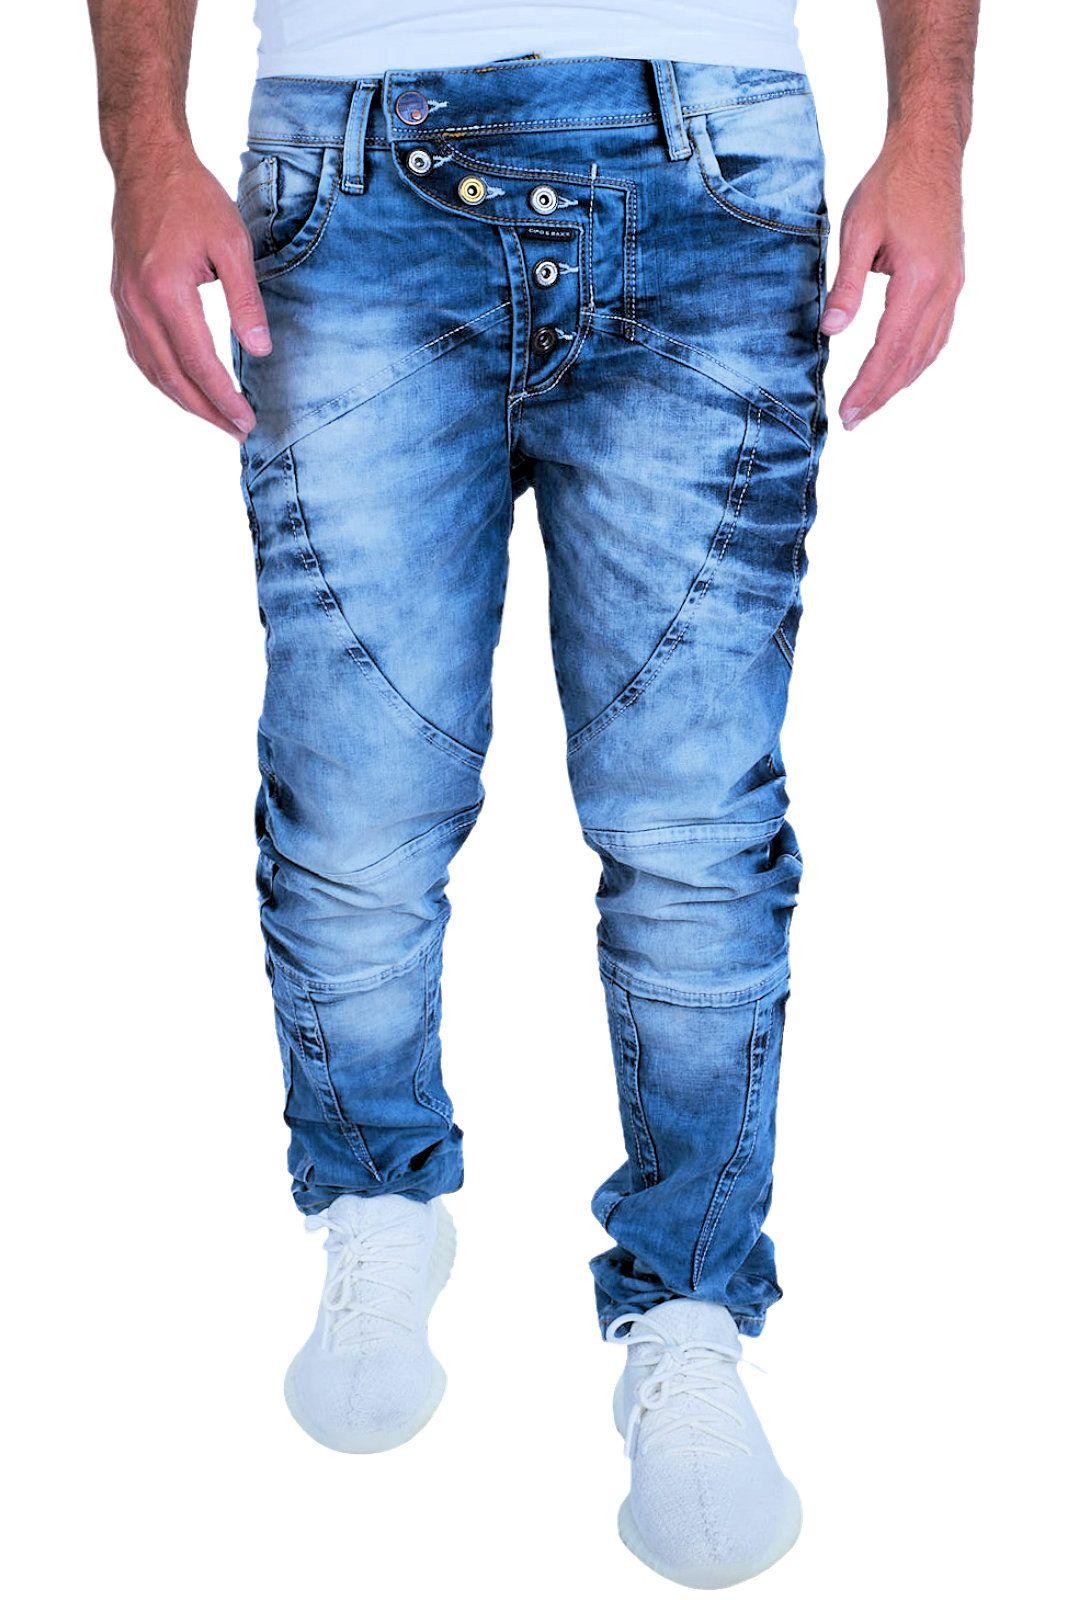 1def92110e45 Details zu CIPO   BAXX Herren Jeans Clubwear Denim Hose CD346 Straight  Trend Dicke Nähte